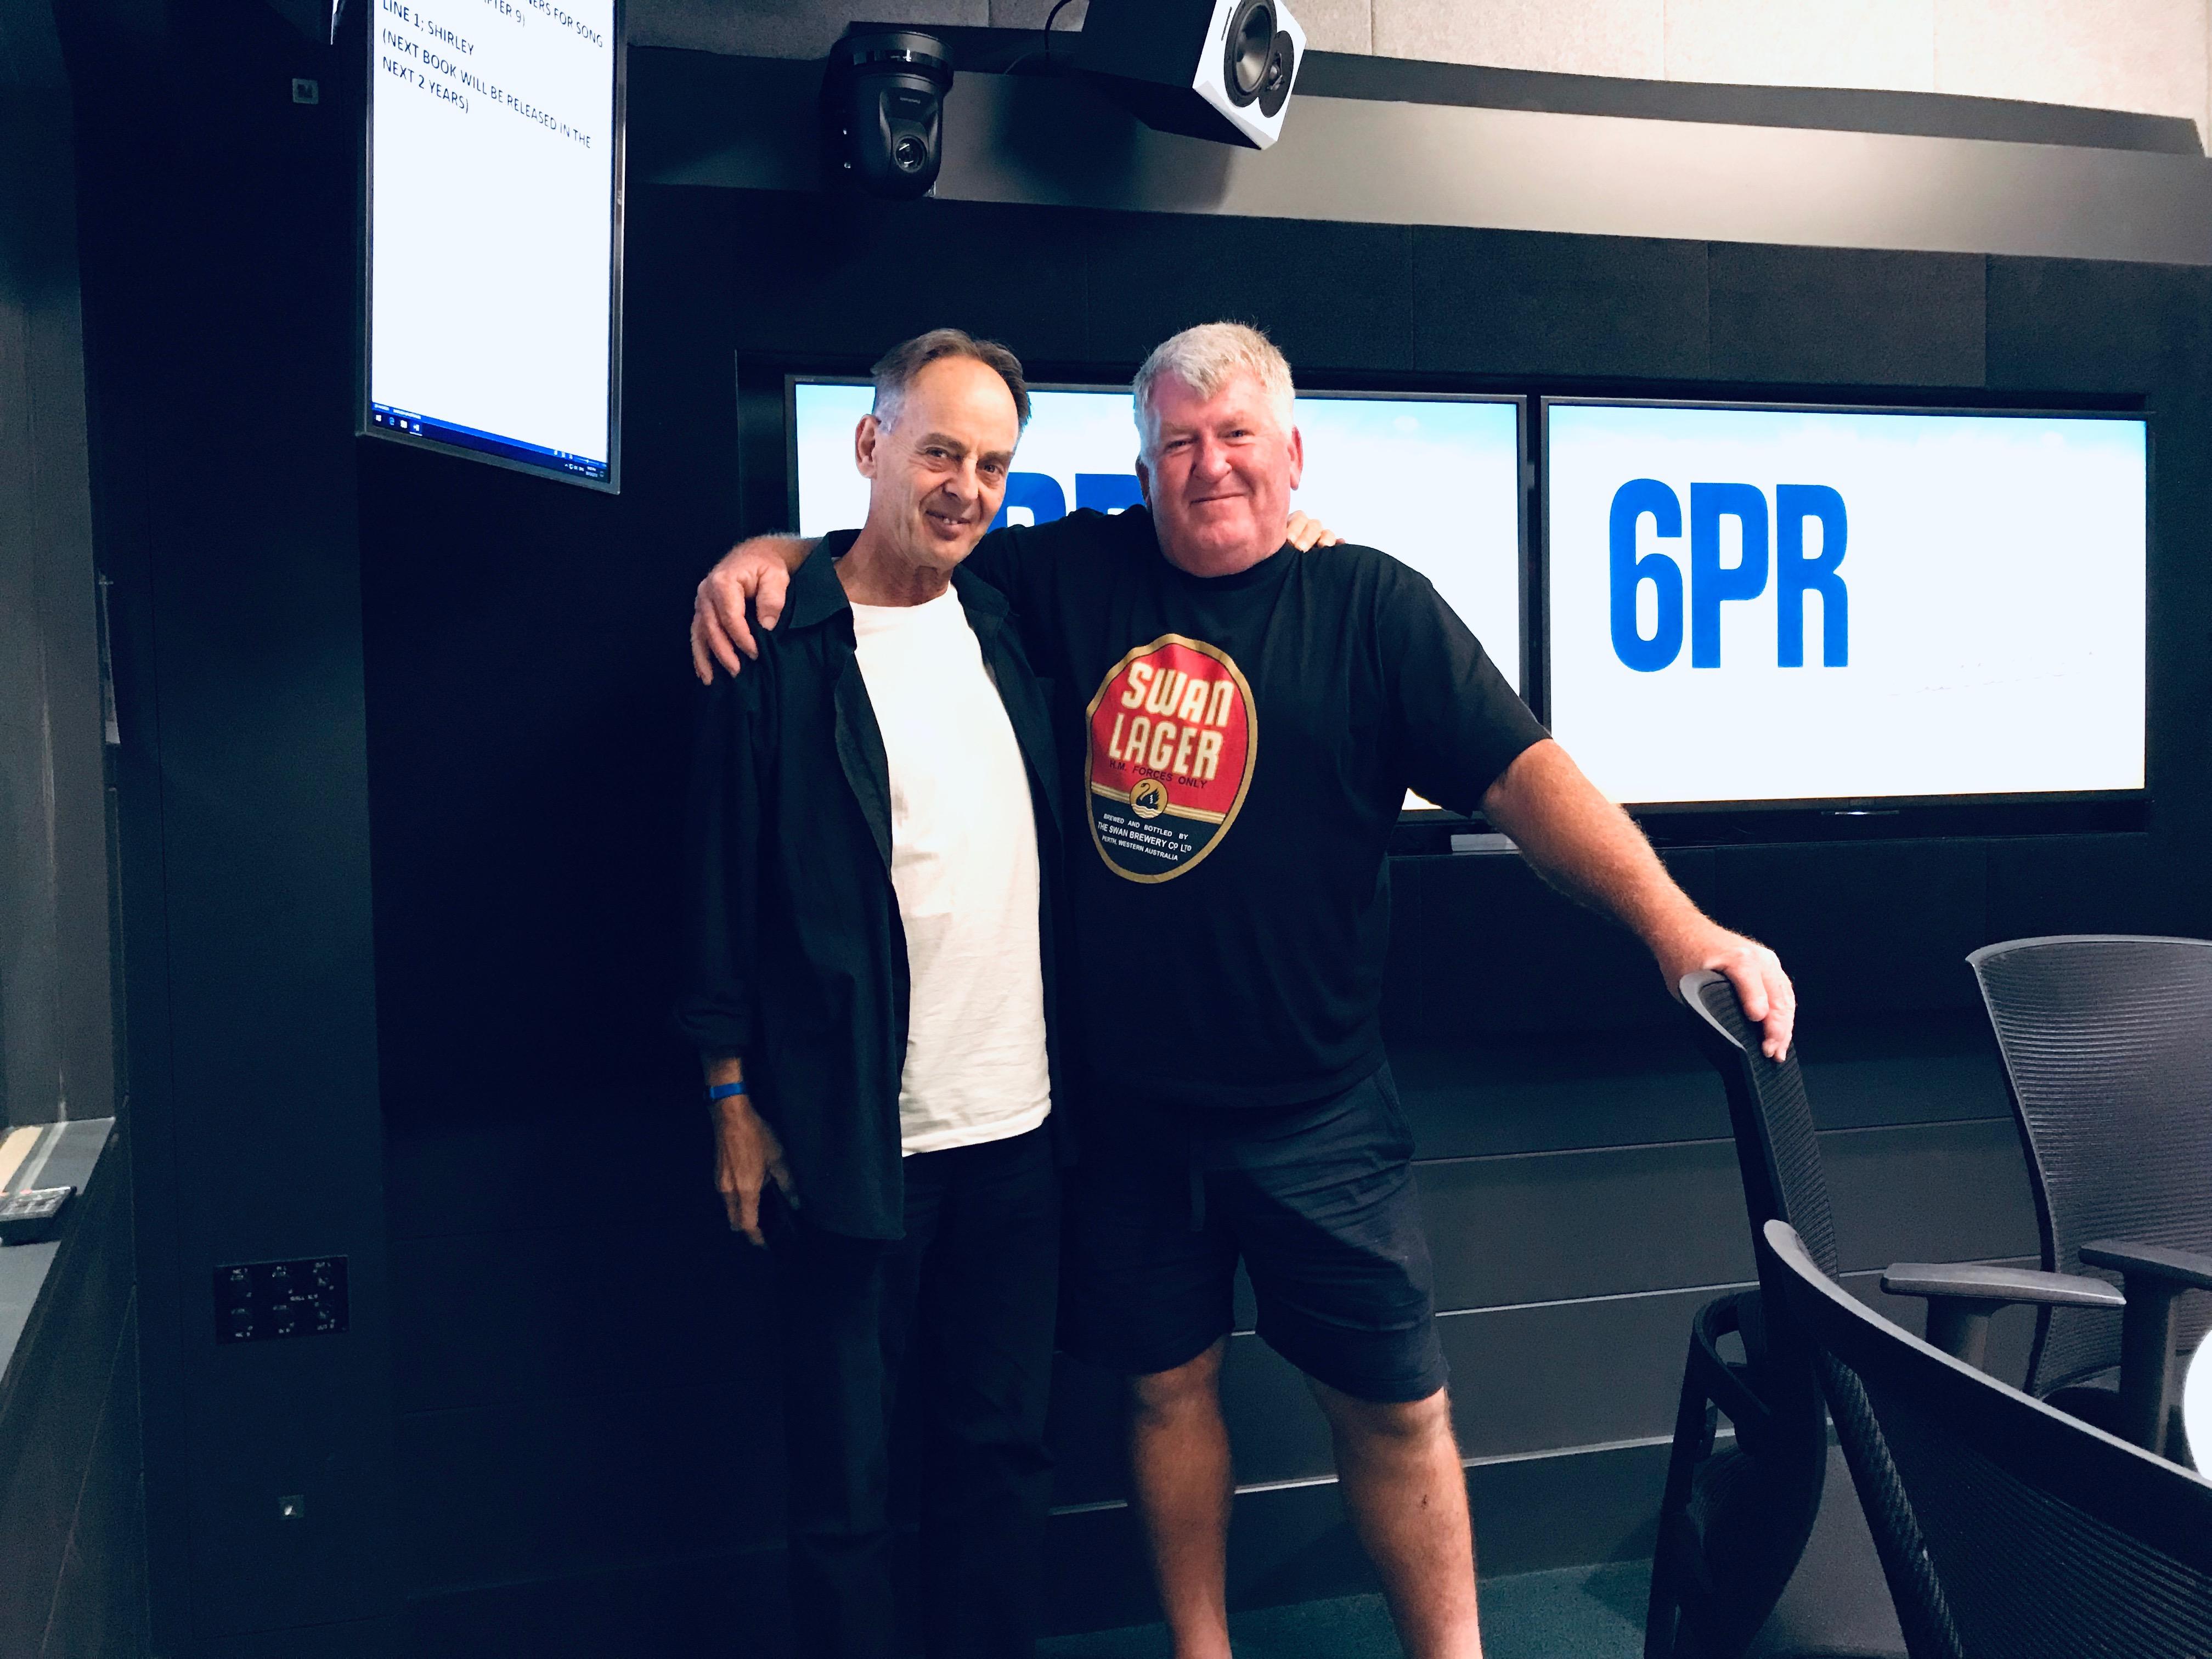 Lost Perth with Warren Duffy